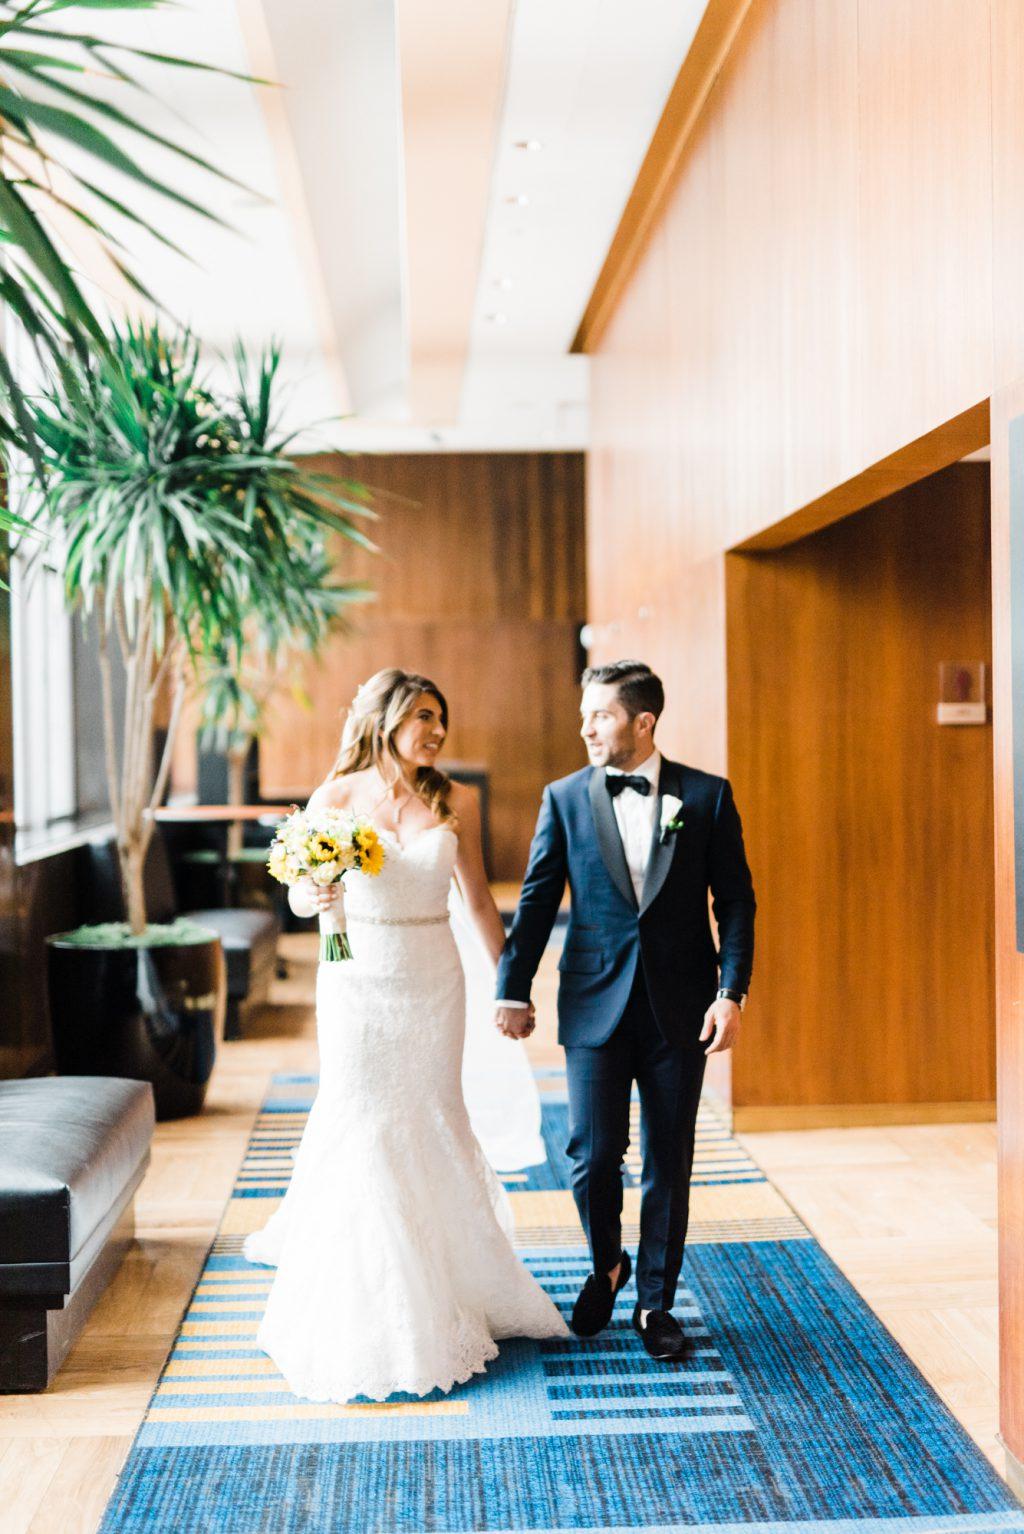 haleyrichterphoto-front-and-palmer-spring-wedding-rodin-museum-loews-hotel-philadelphia-049